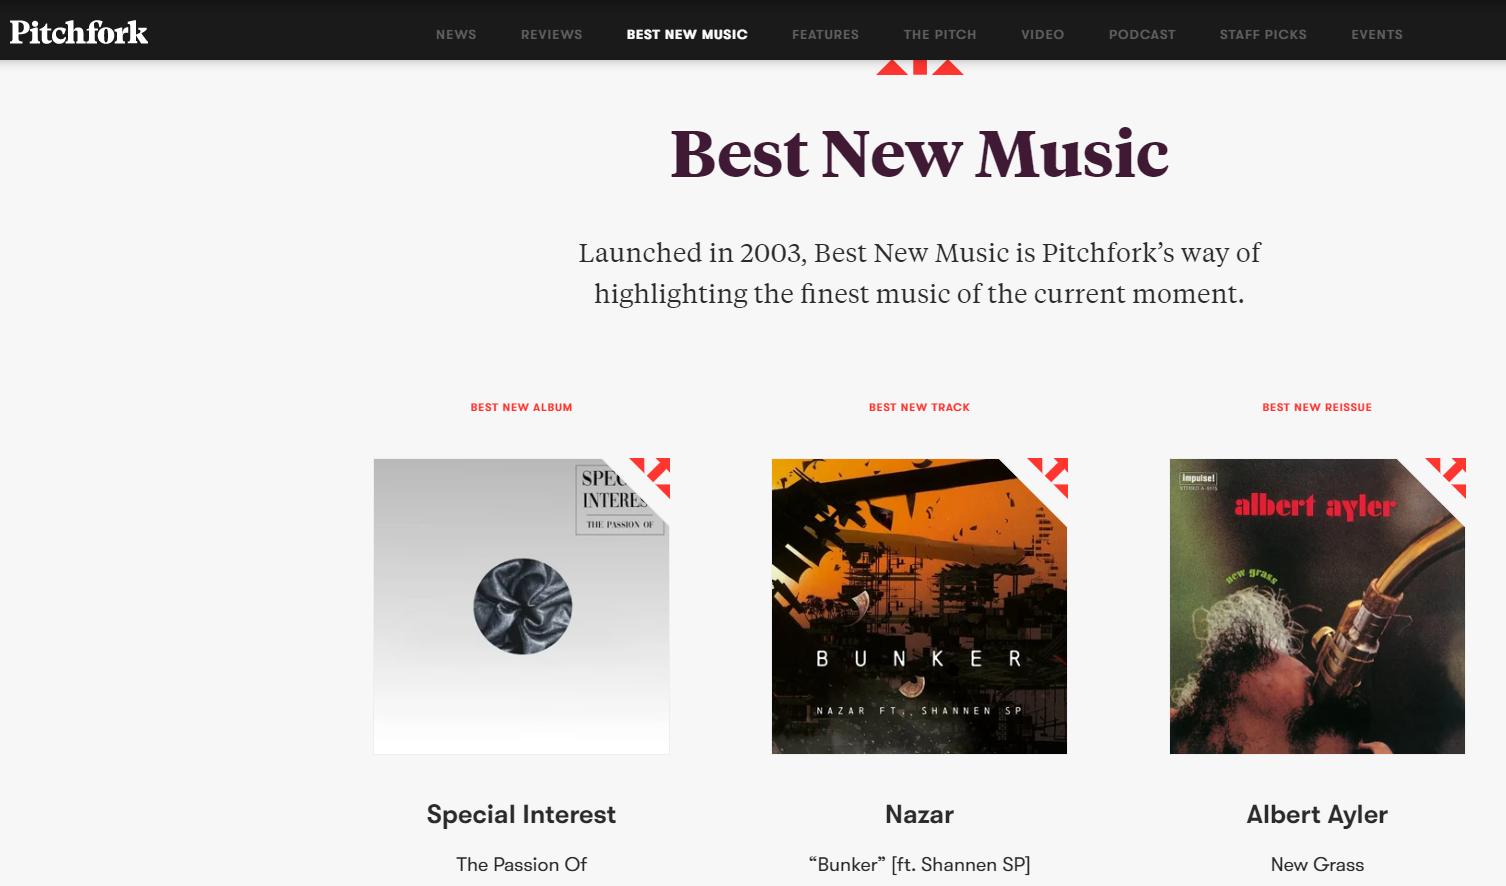 Pitchfork music blog best new music section